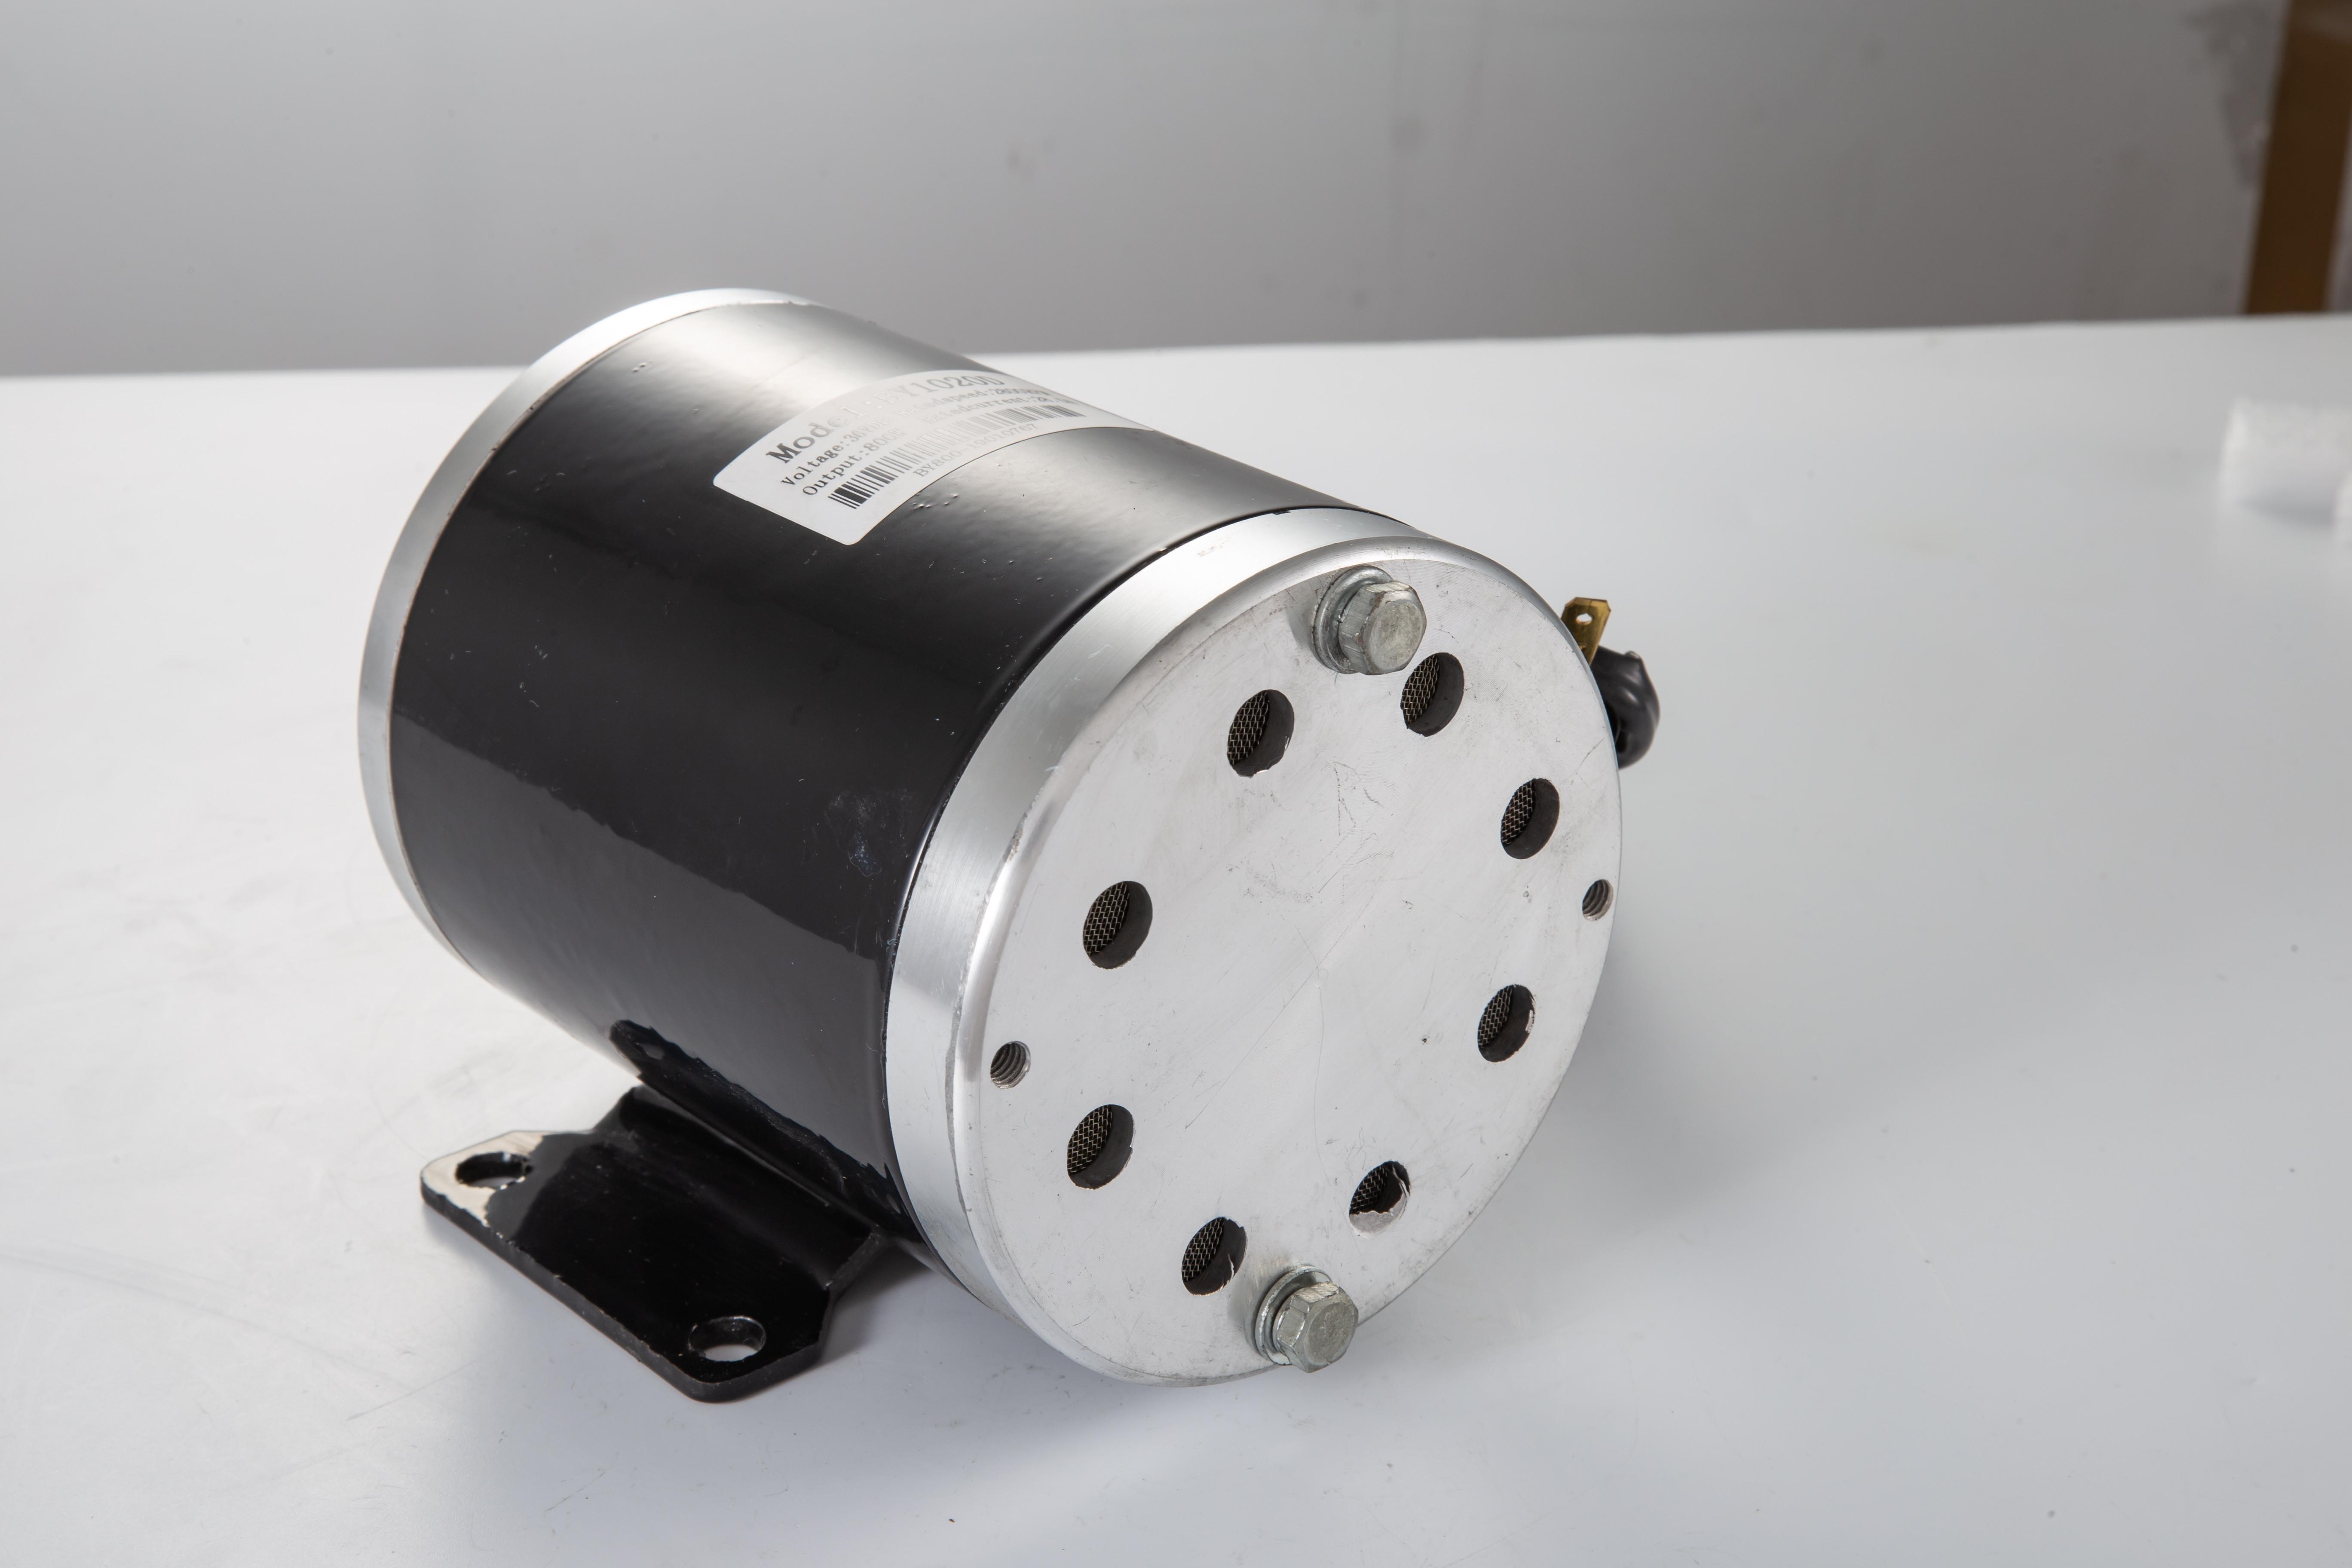 36v-Electric-Motor-controller-throttle-kit-f-Scooter-E-Scooter-ATV-Permanent thumbnail 114